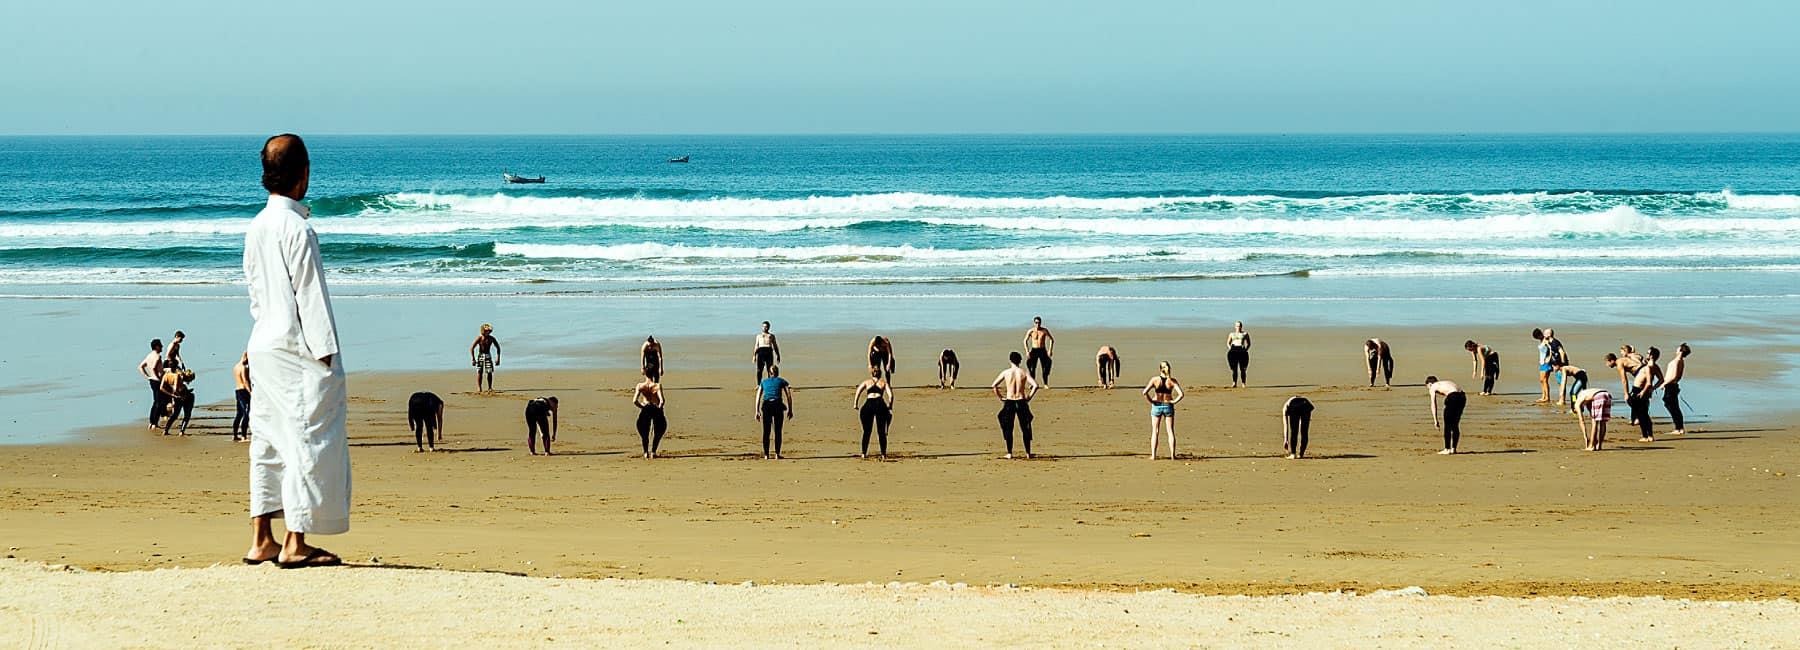 beginner surf lessons blue waves morocco